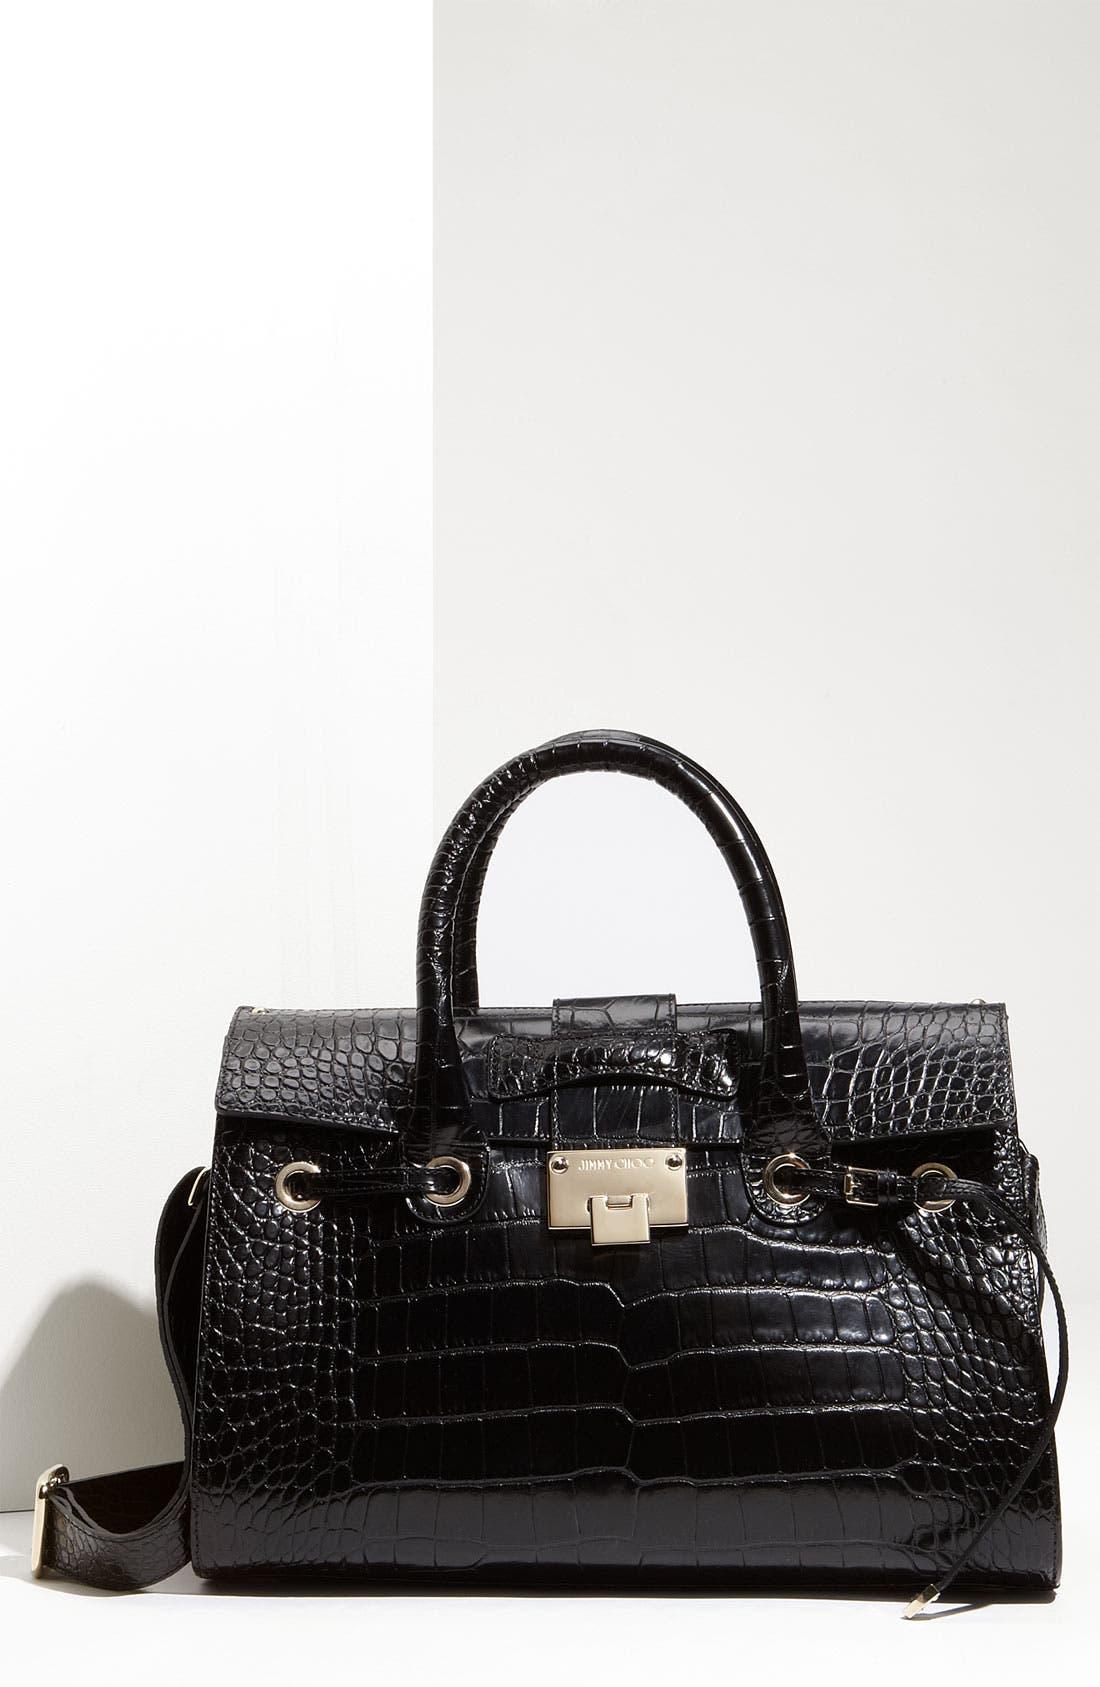 Alternate Image 1 Selected - Jimmy Choo 'Rosalie' Leather Satchel